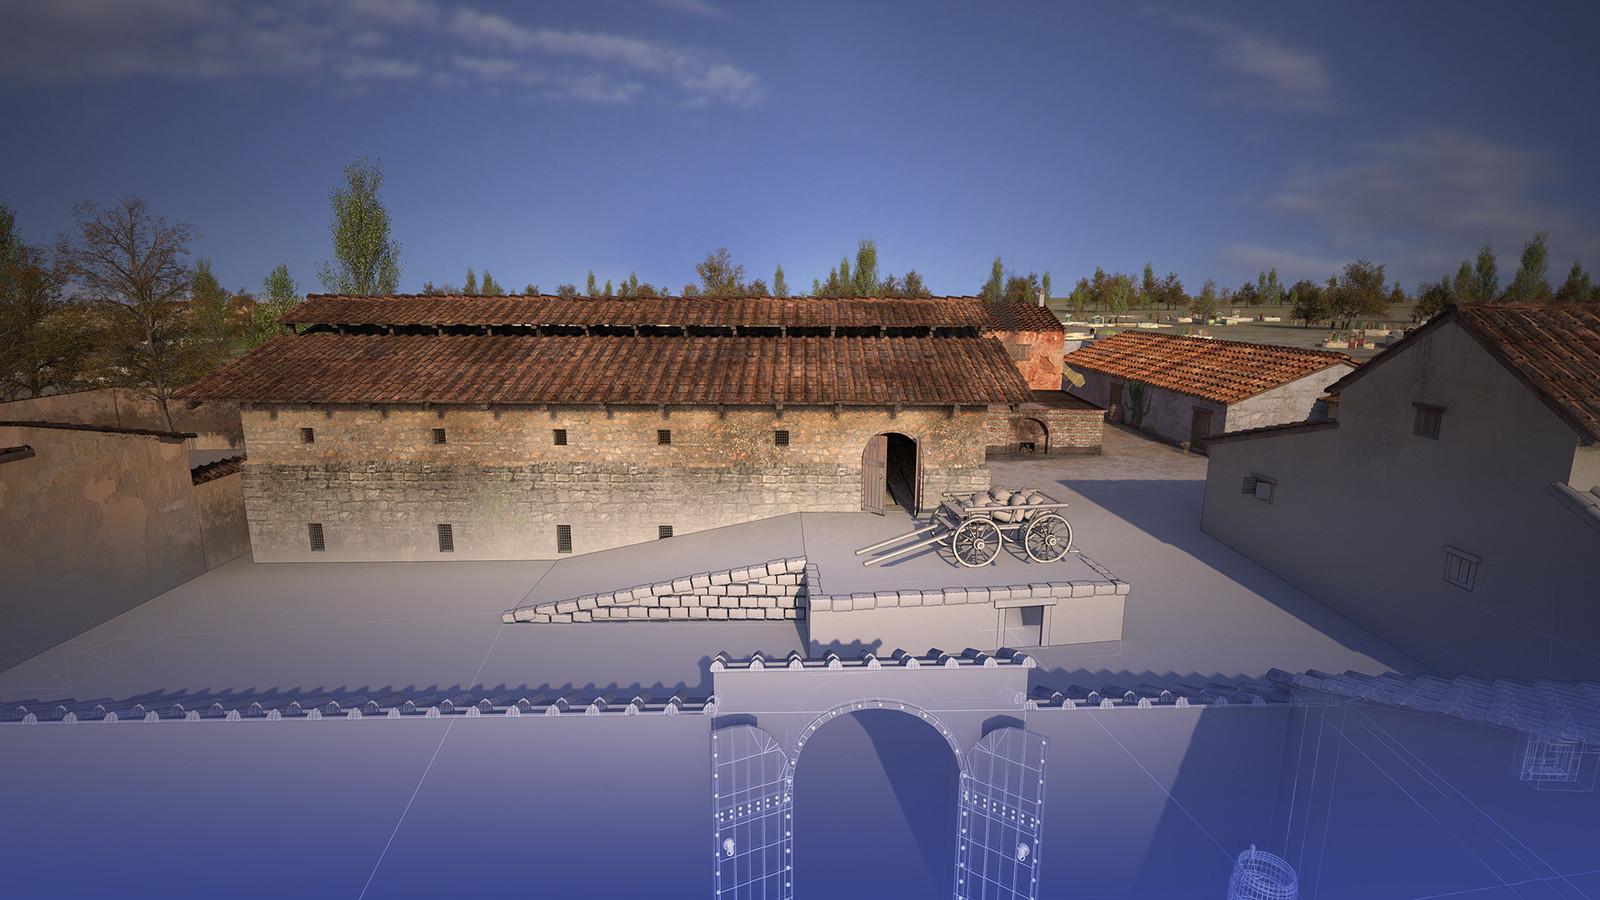 Horreum (Roman granary) - visualization process